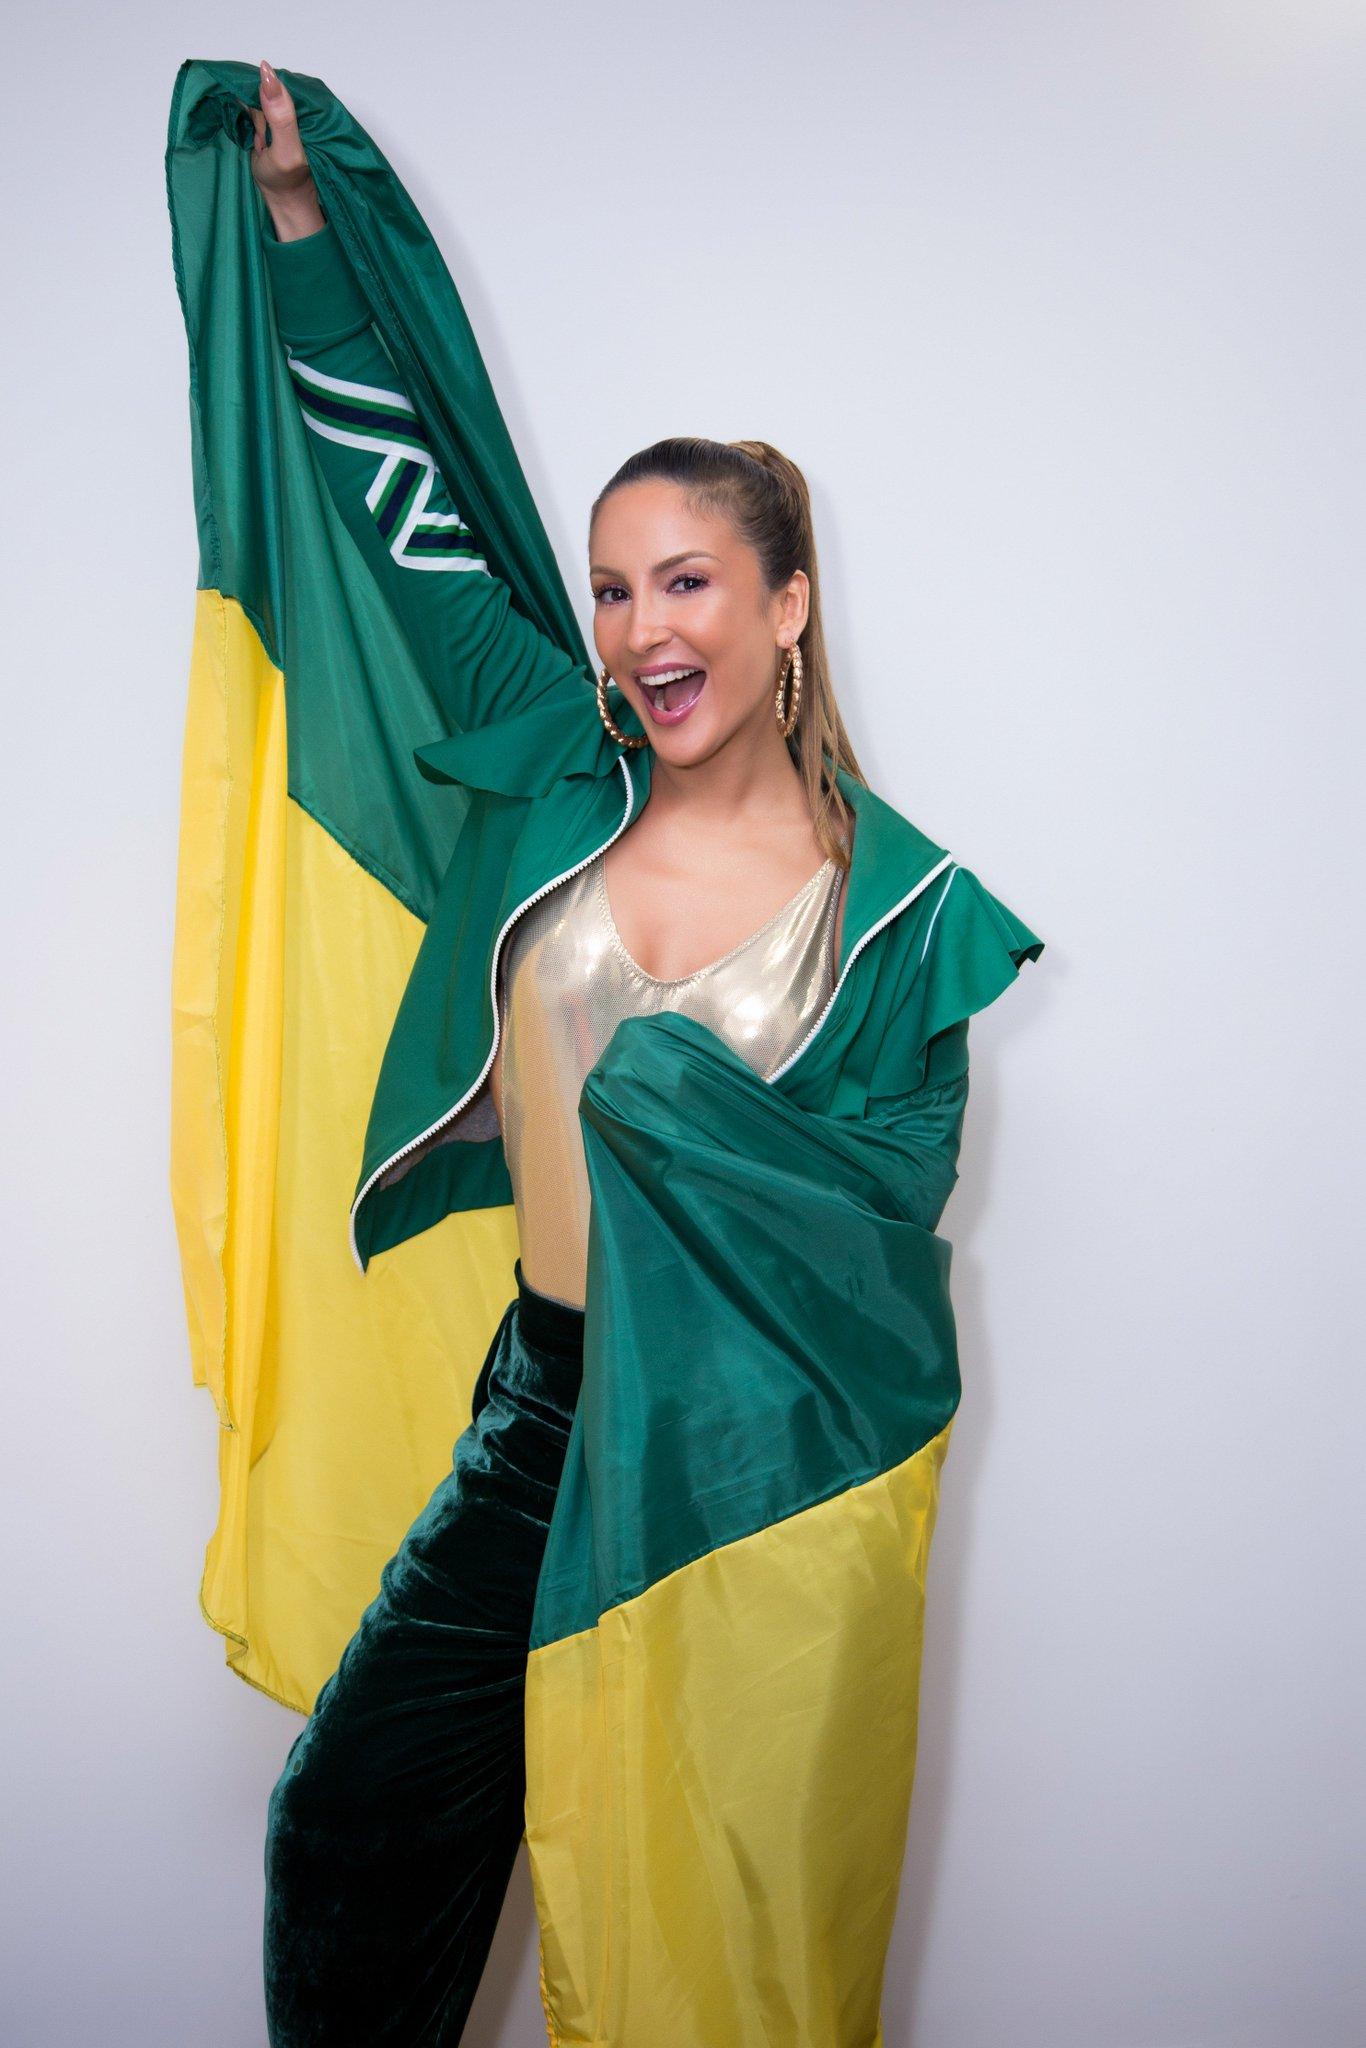 Pode ter o Brasil inteiro na torcida. Pode acreditar, pode torcer! Bora, Brasil! ���� #PodeTerTorcida https://t.co/Xye28Hq2Ef